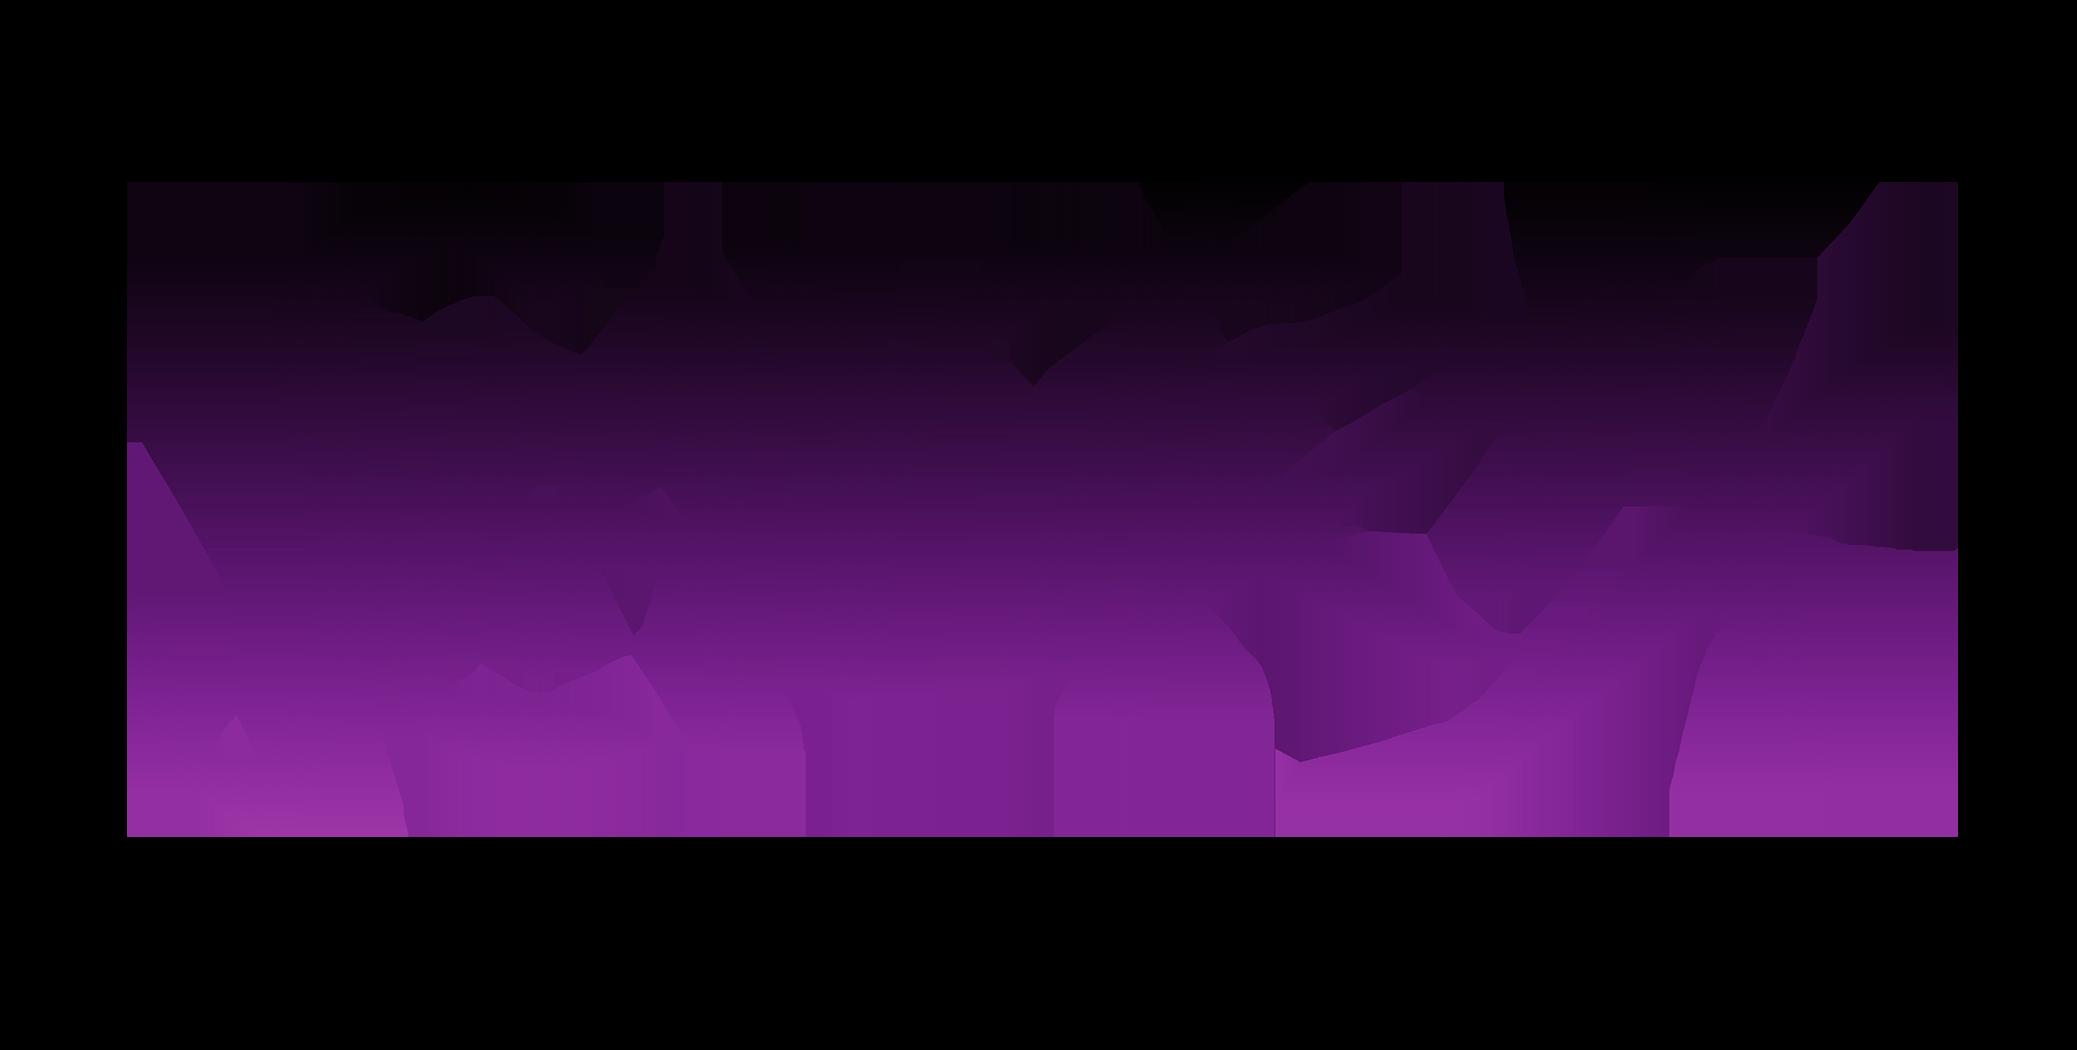 4.Slaytrix_LOGO_AlphaPurp_FINAL1-copy-2.png